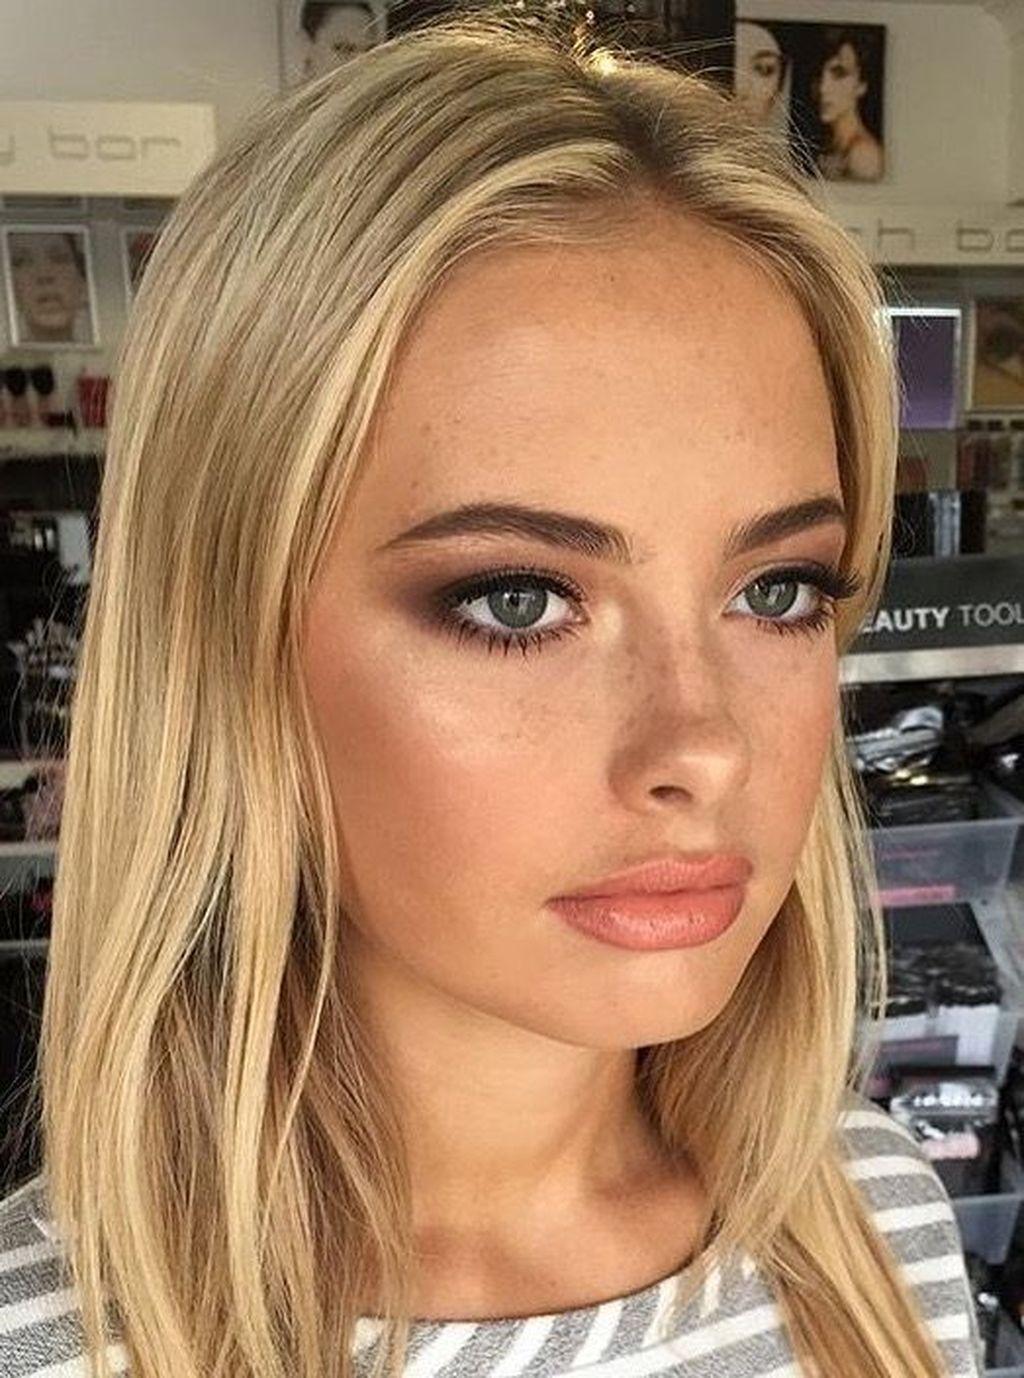 30 Best Natural Glow Makeup Ideas That Every Girl Will Want To Try Natural Glow Makeup Glowing Makeup Photoshoot Makeup